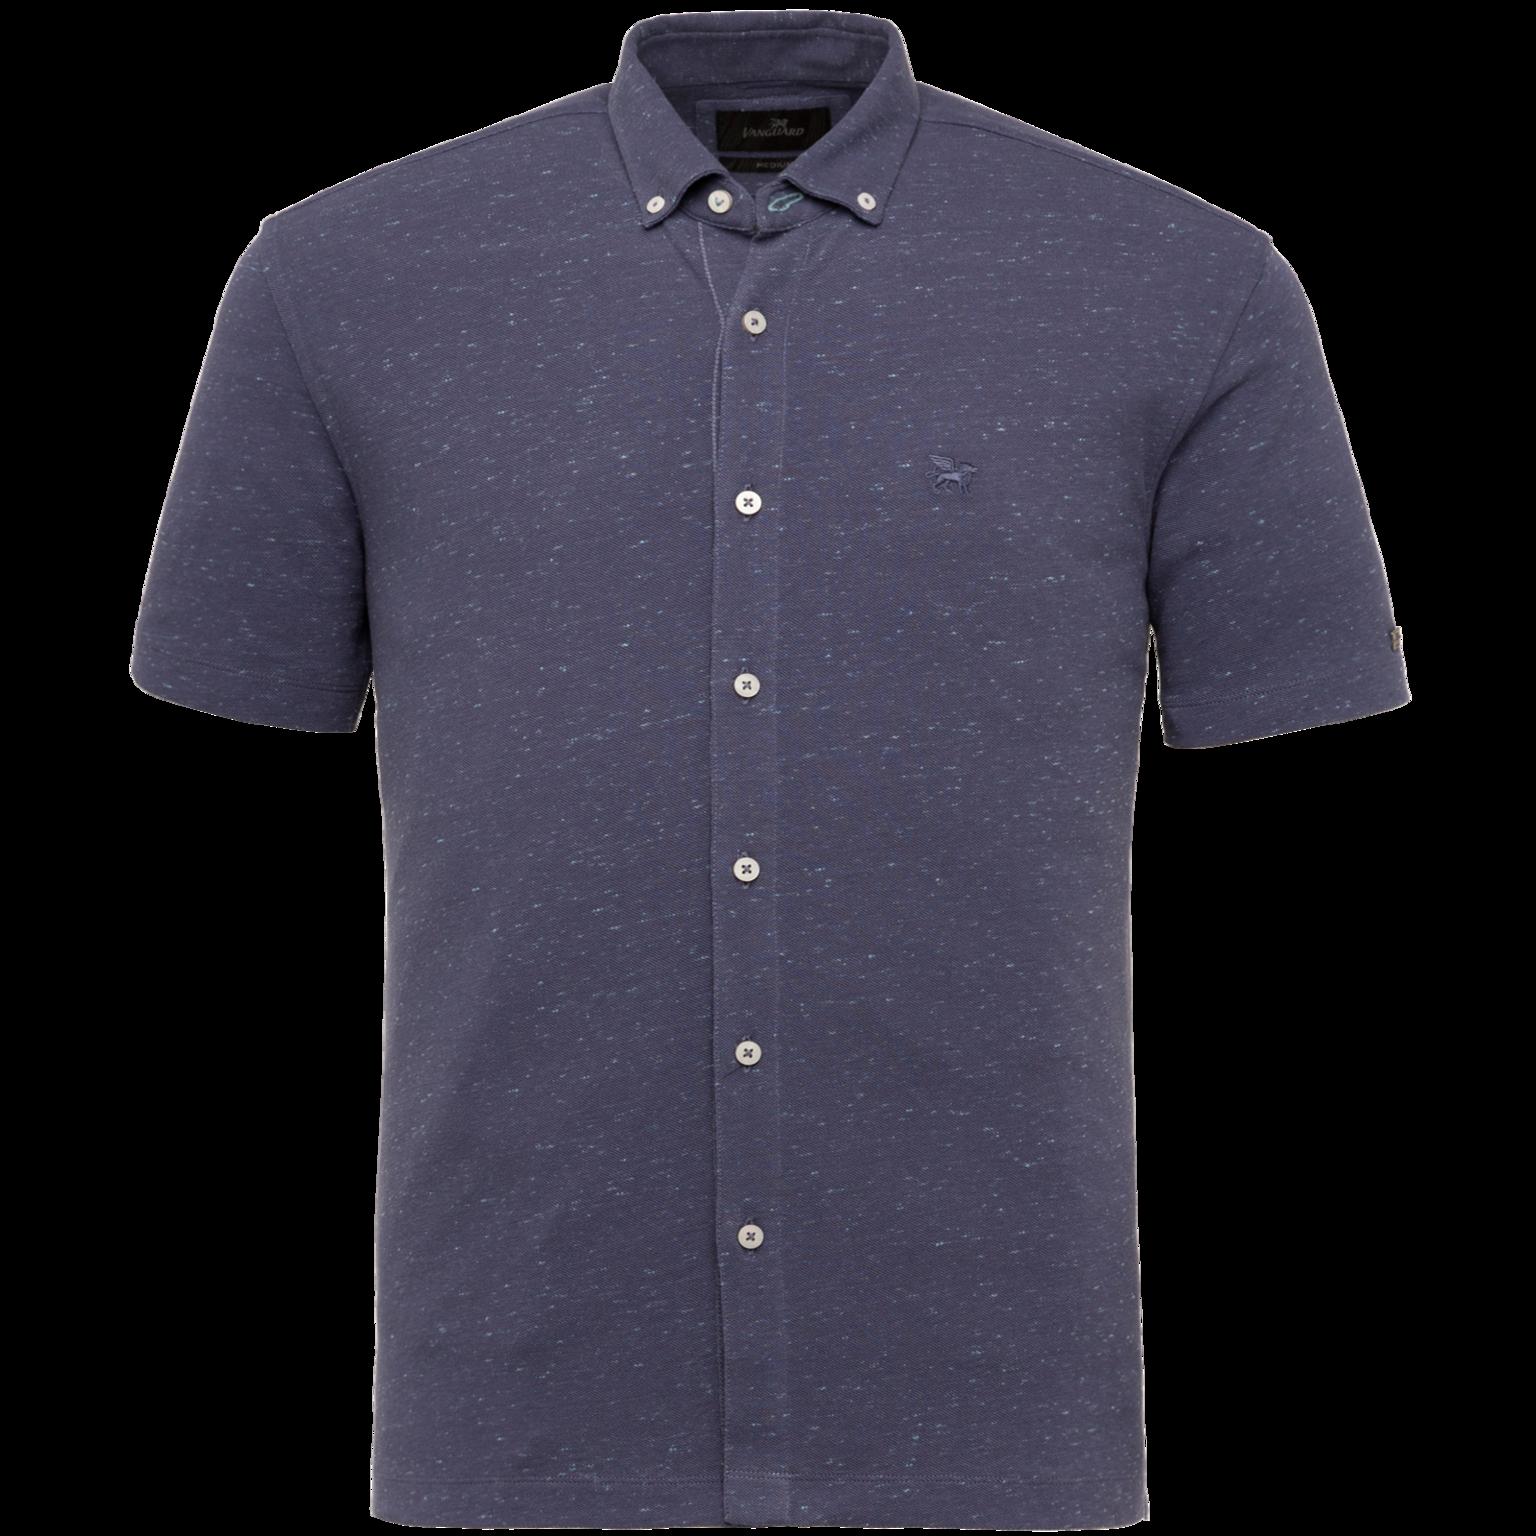 VANGUARD chemise manches courtes-1